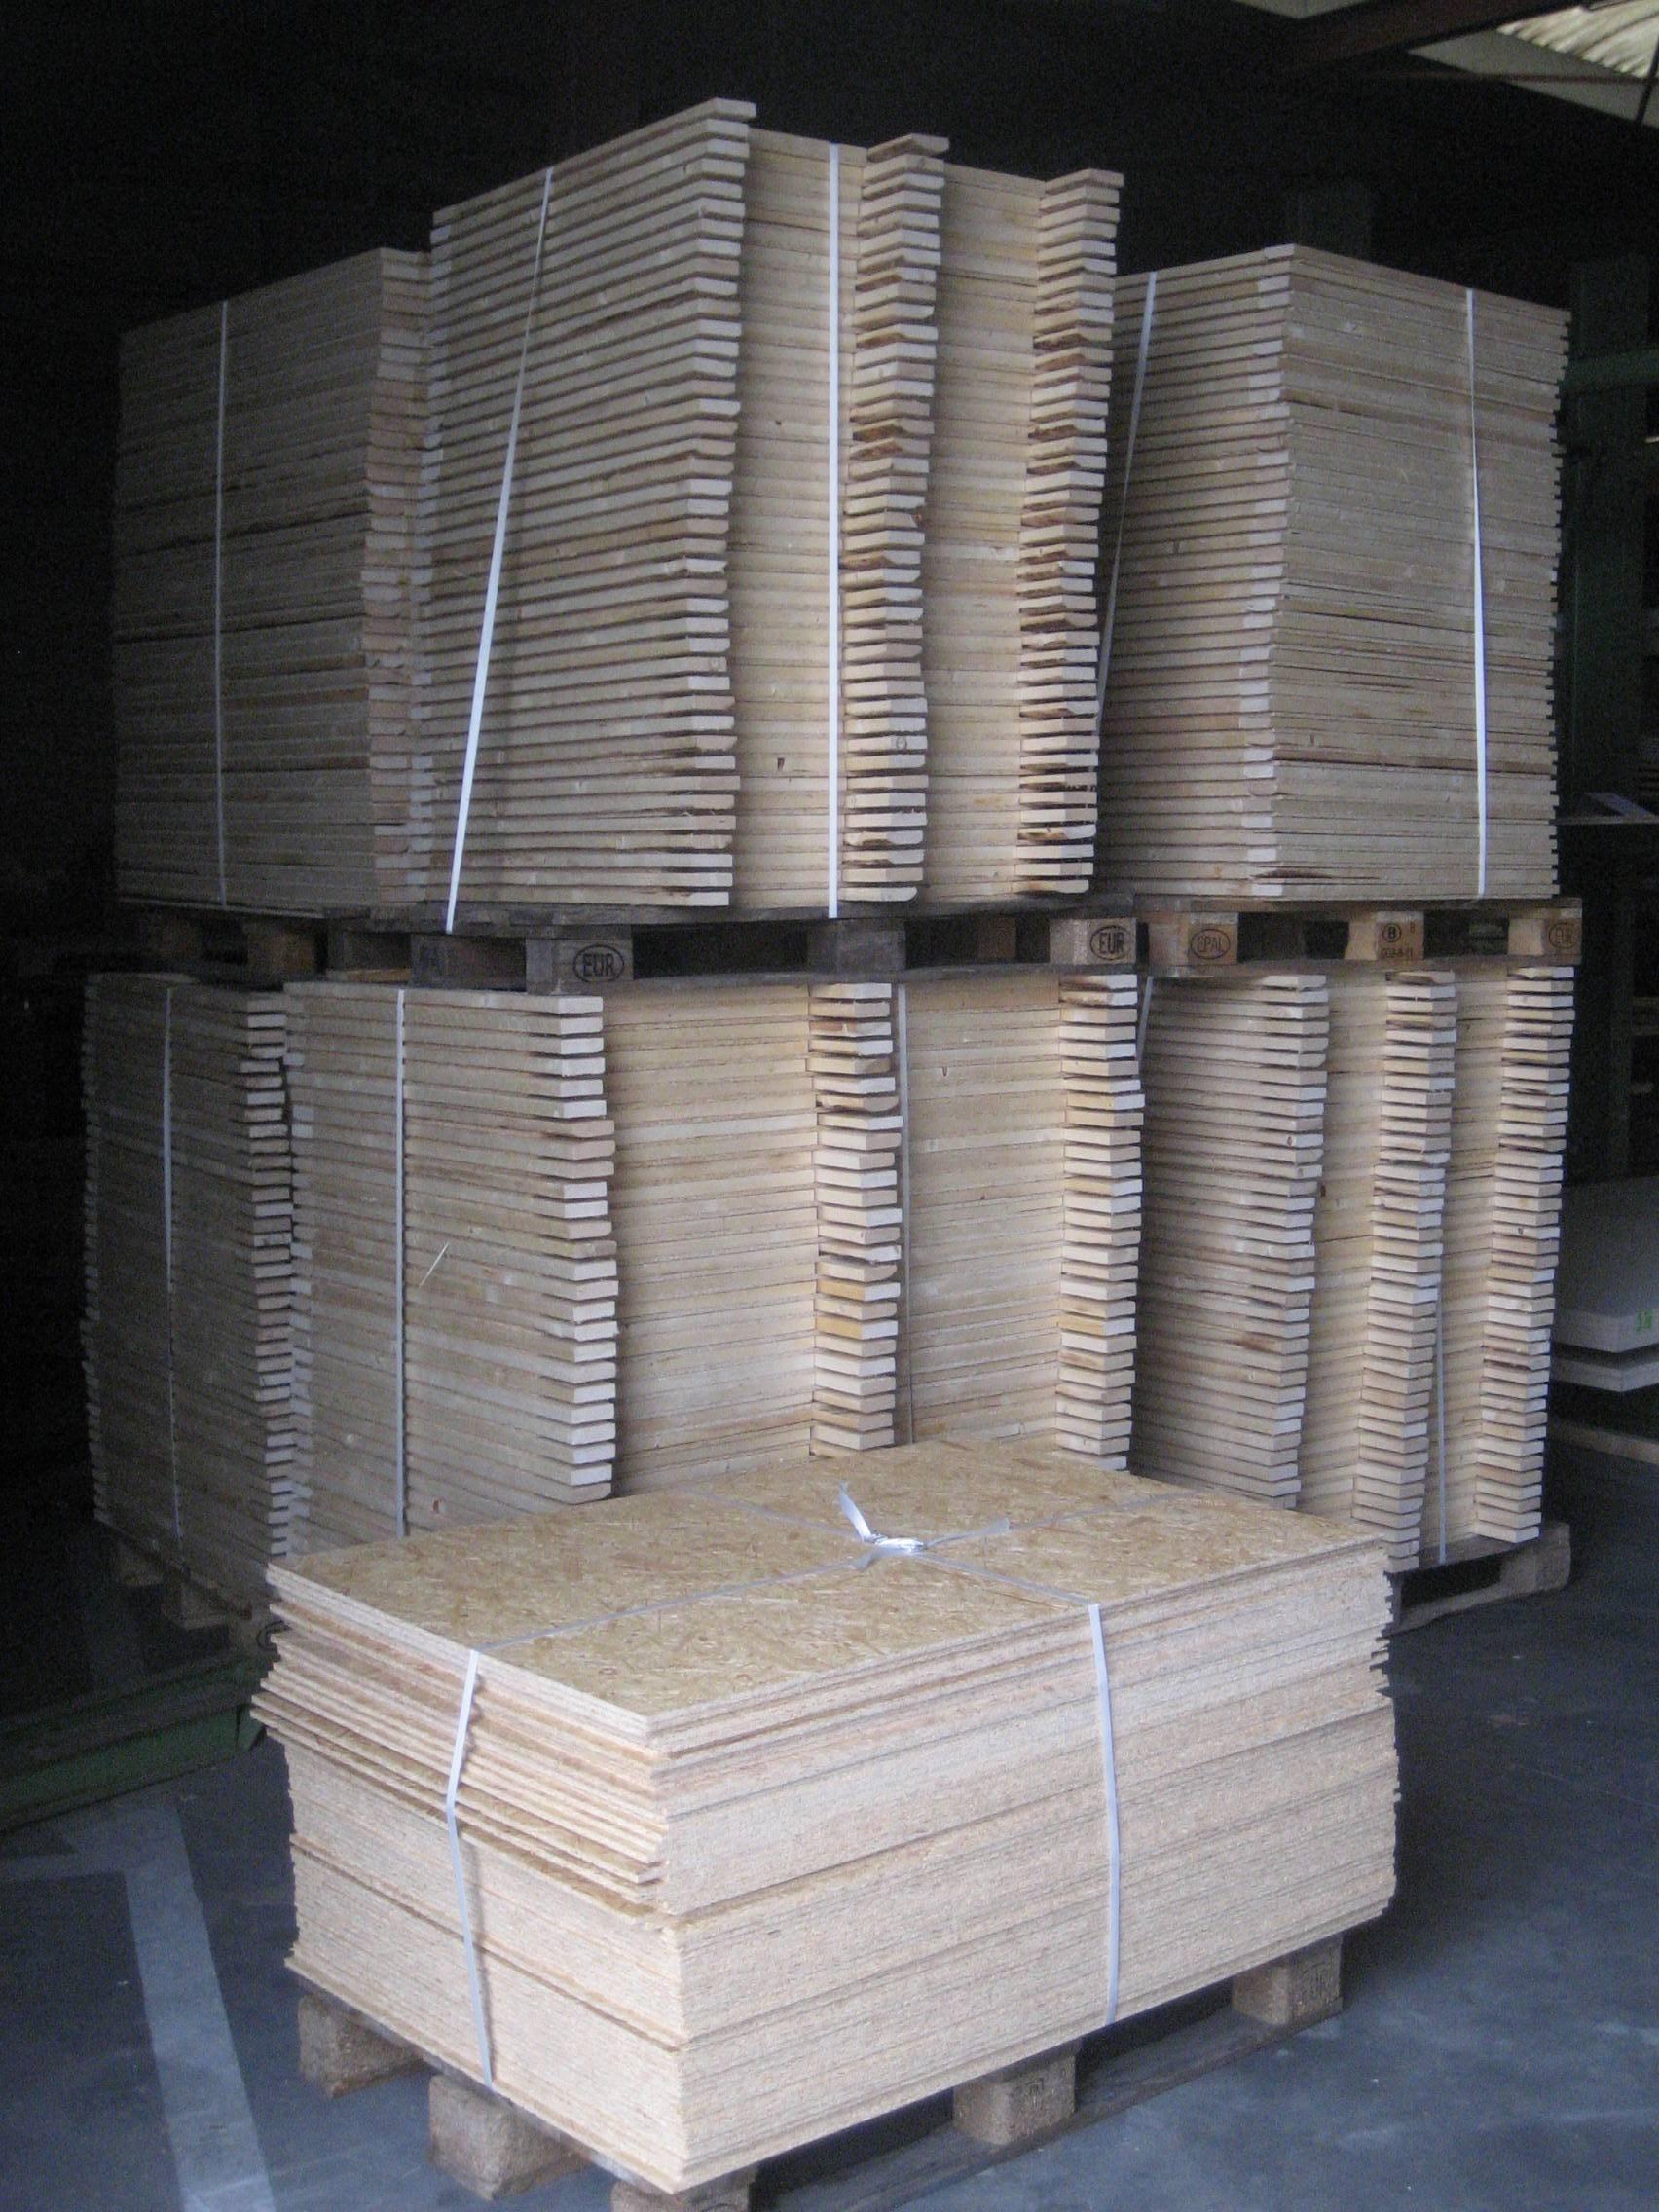 Onderdelen kisten